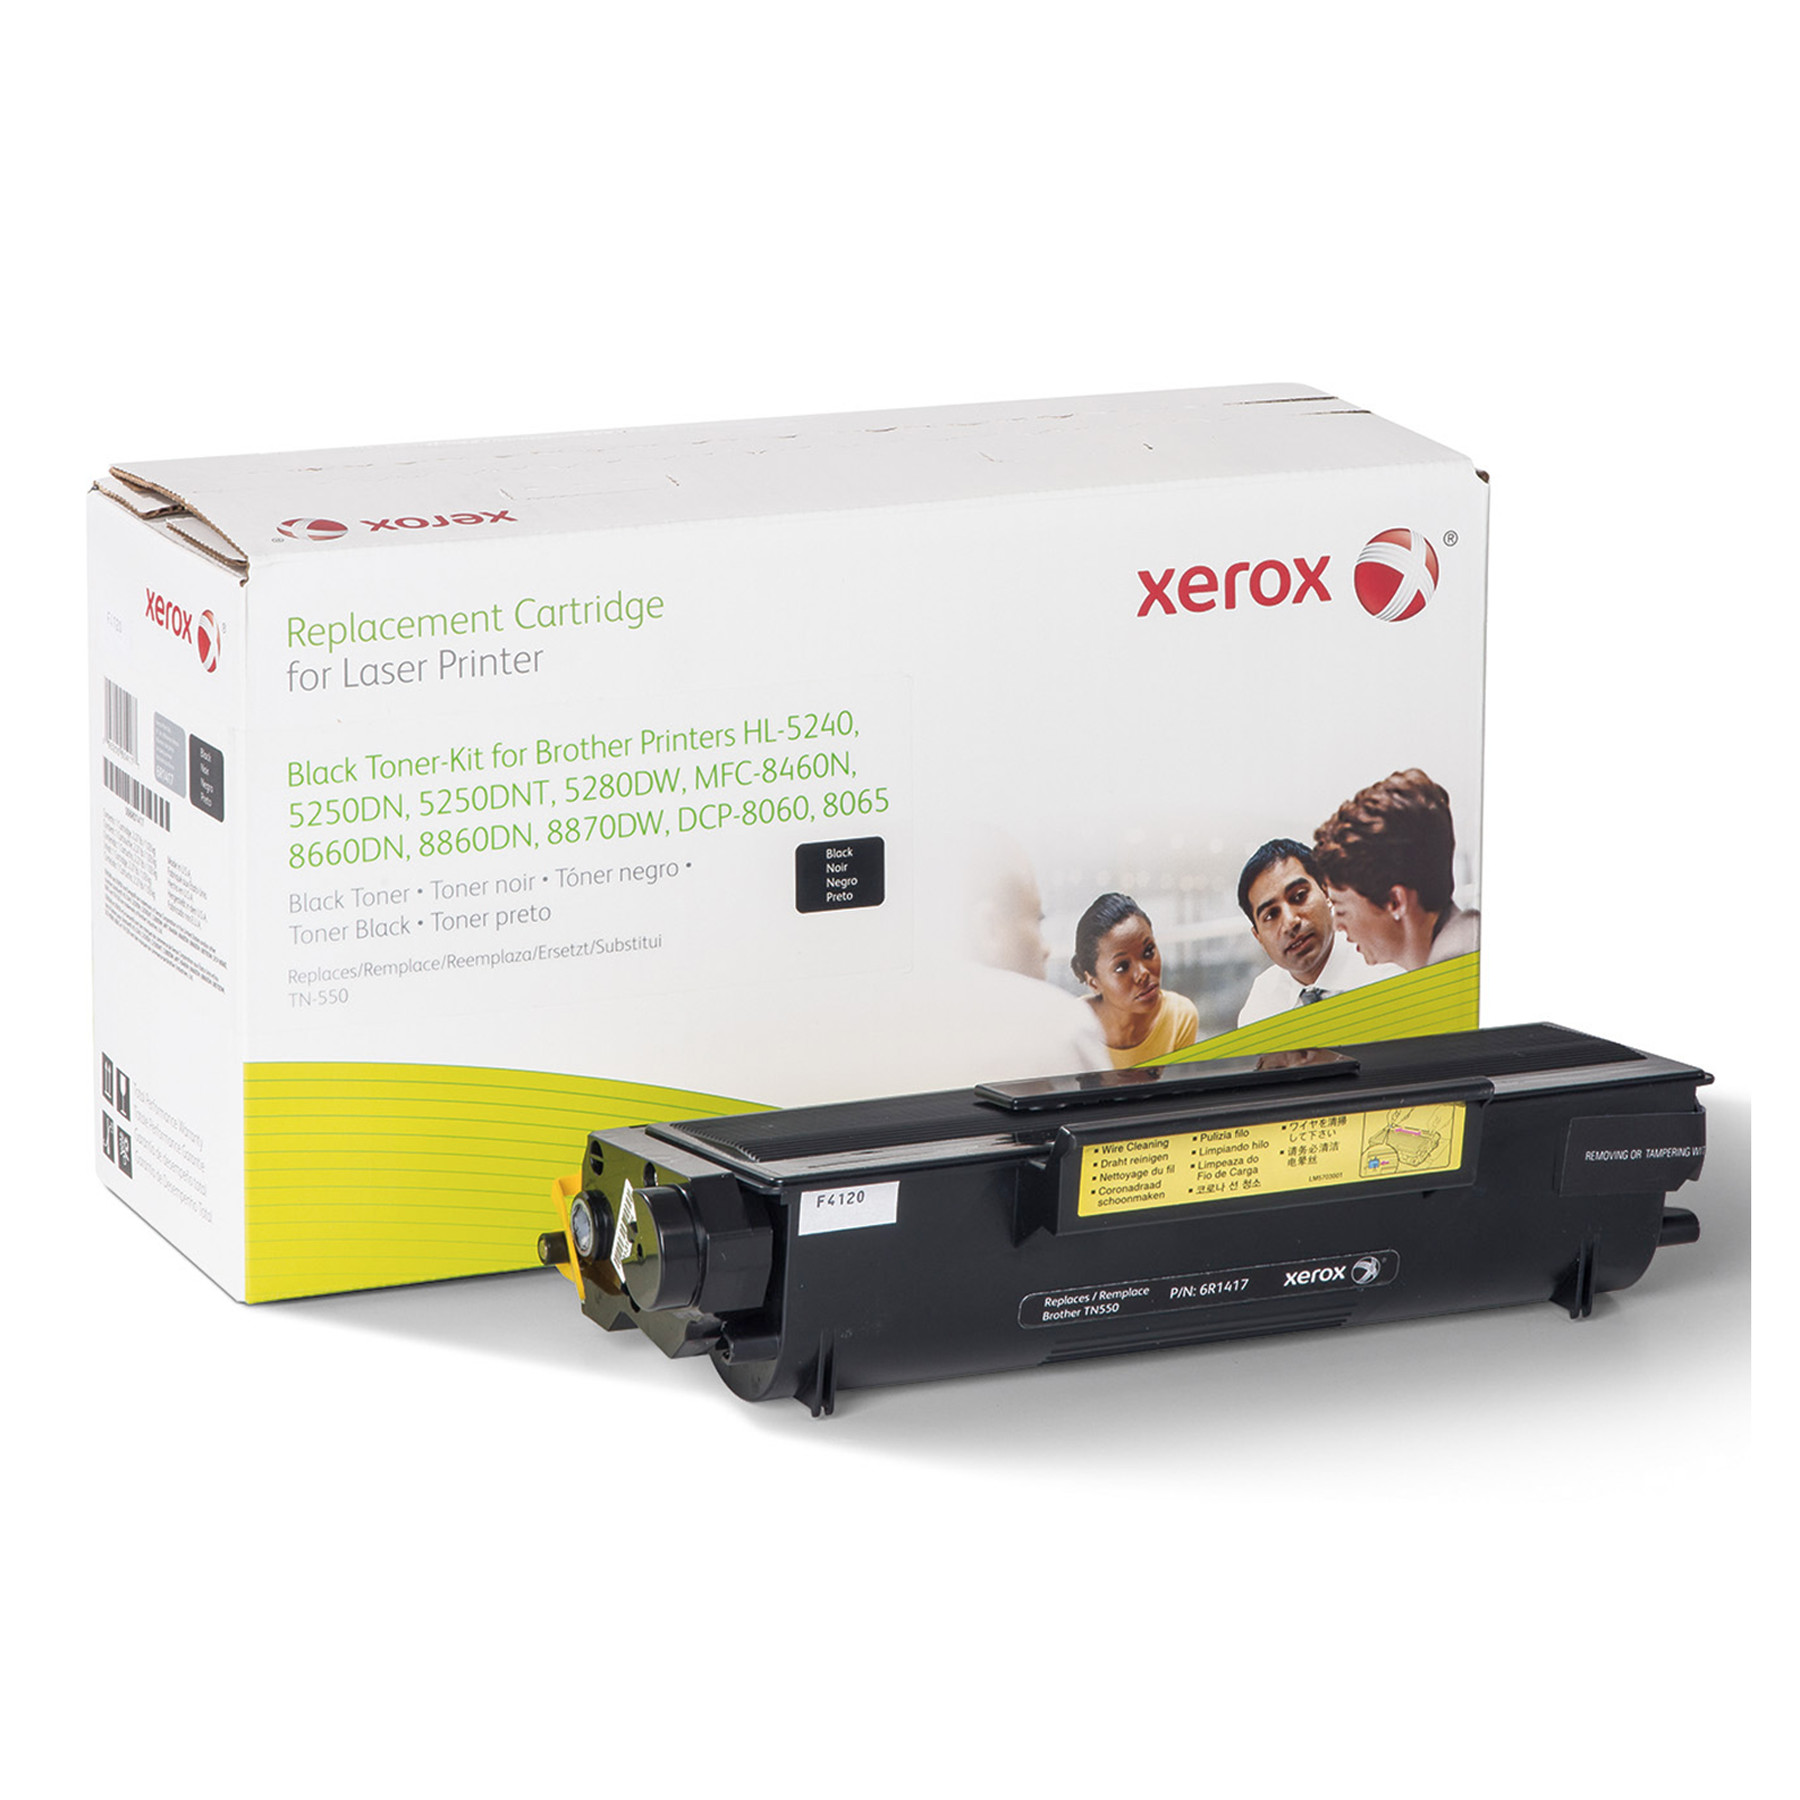 Xerox 006R01417 Remanufactured TN550 Toner, Black